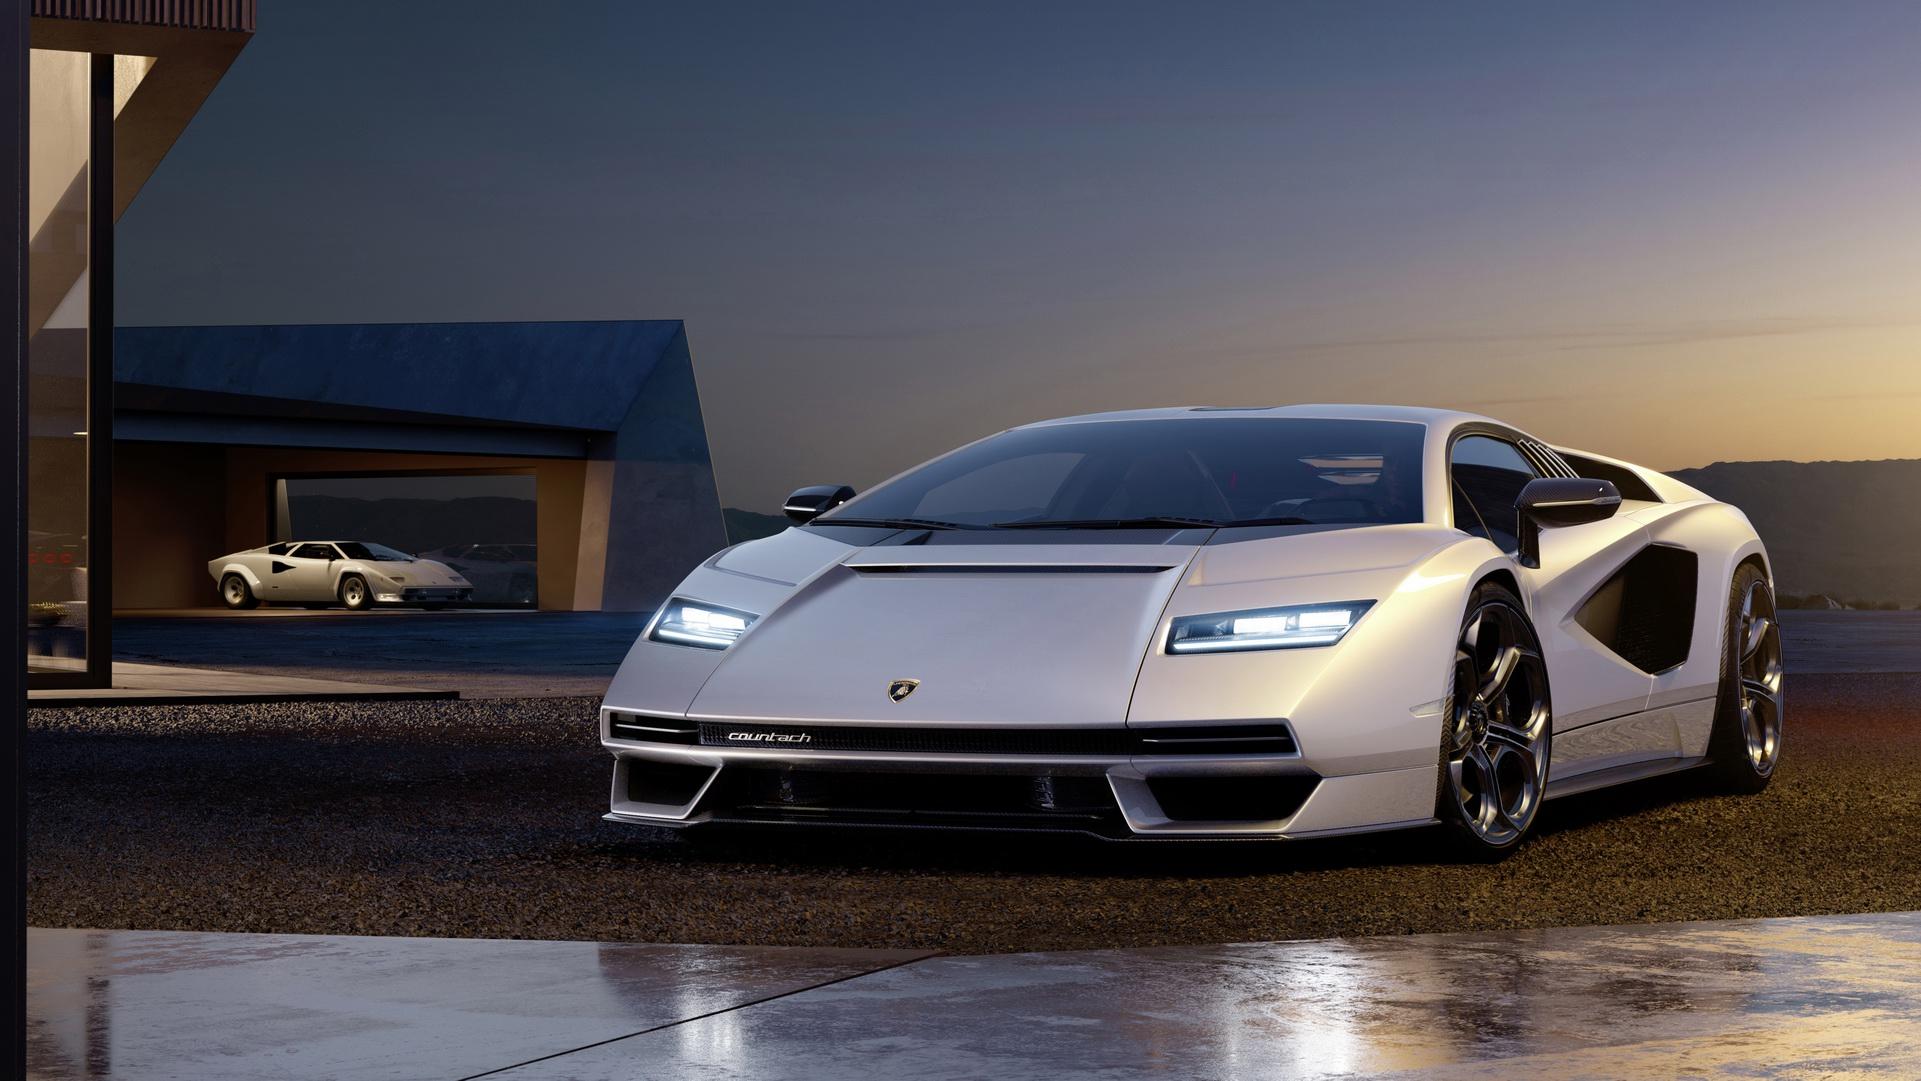 2022 Lamborghini Countach LPI 800-4 Front Wallpapers (1)